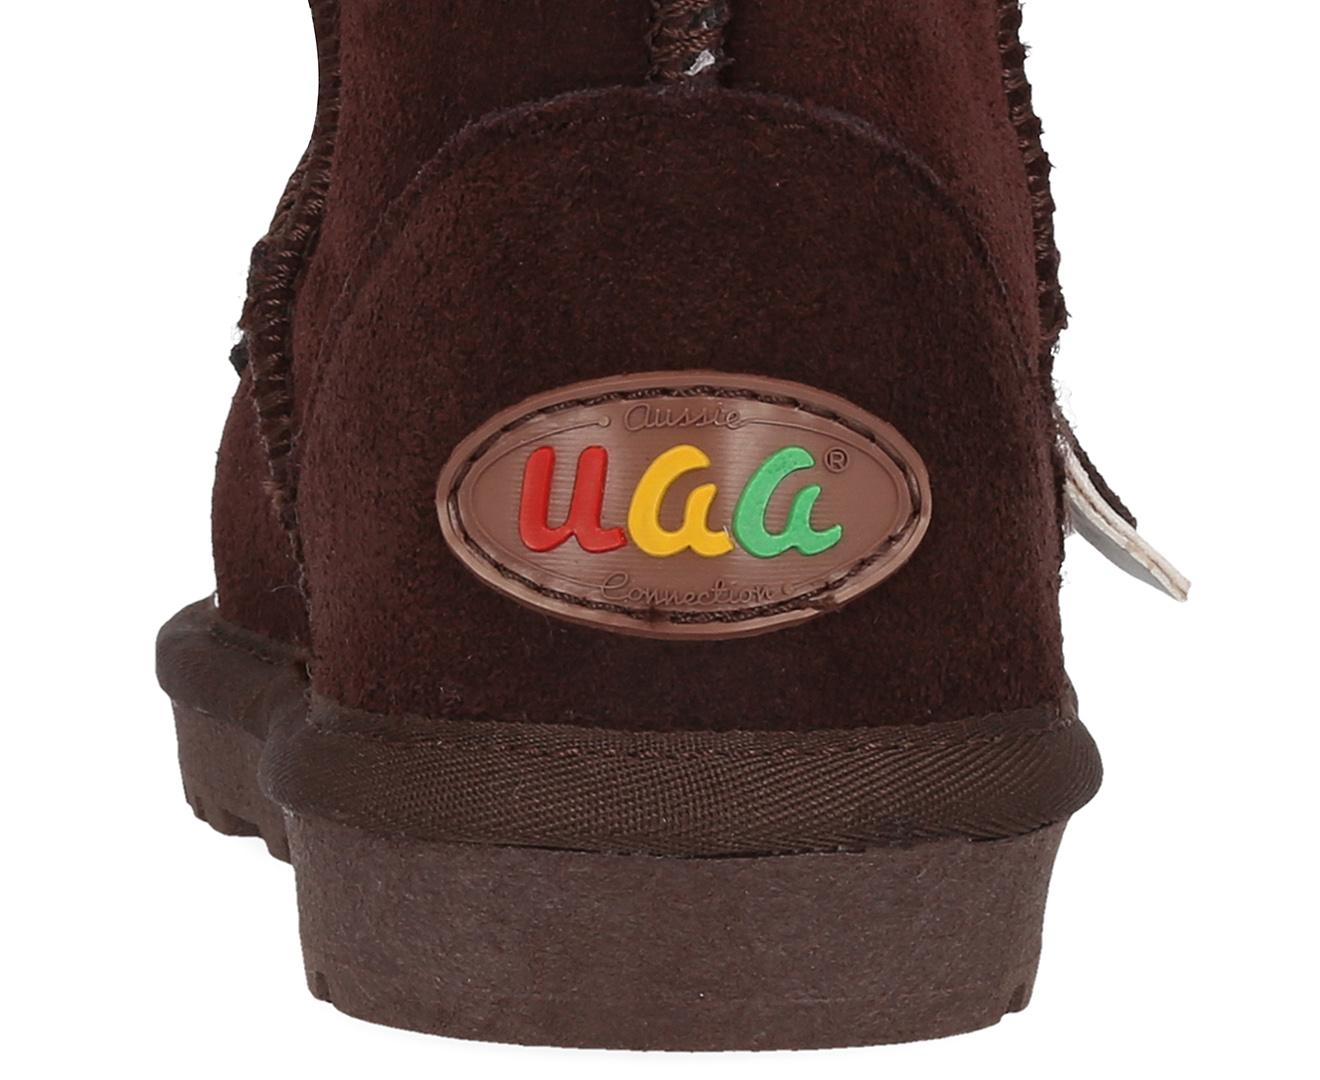 33a347beda9 Bluestar Kids' Premium Australian Sheepskin Donkey Ugg Boot - Chocolate